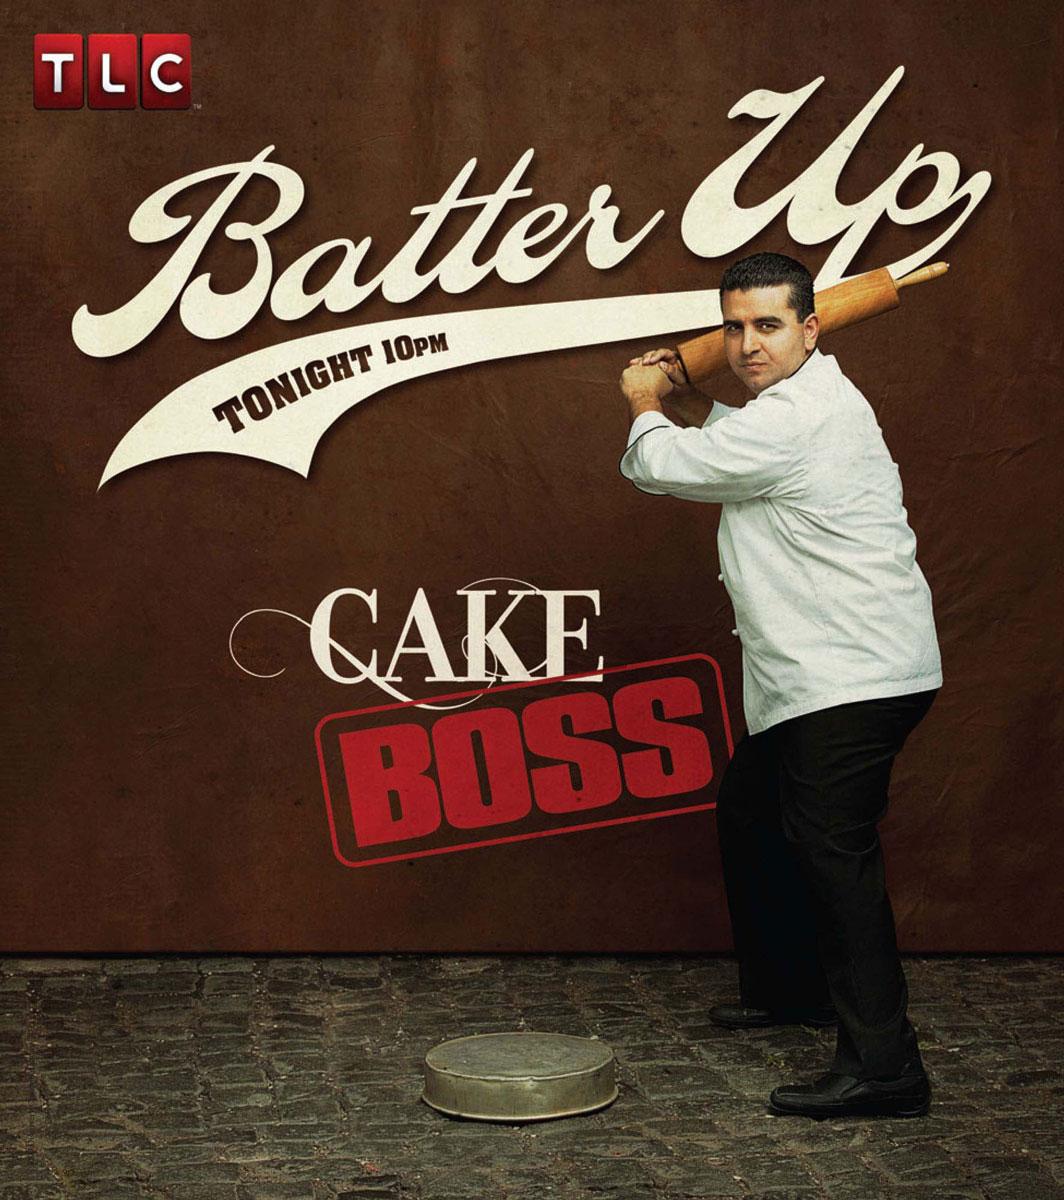 1_Cake_Boss_TLC_George_Lange.jpg